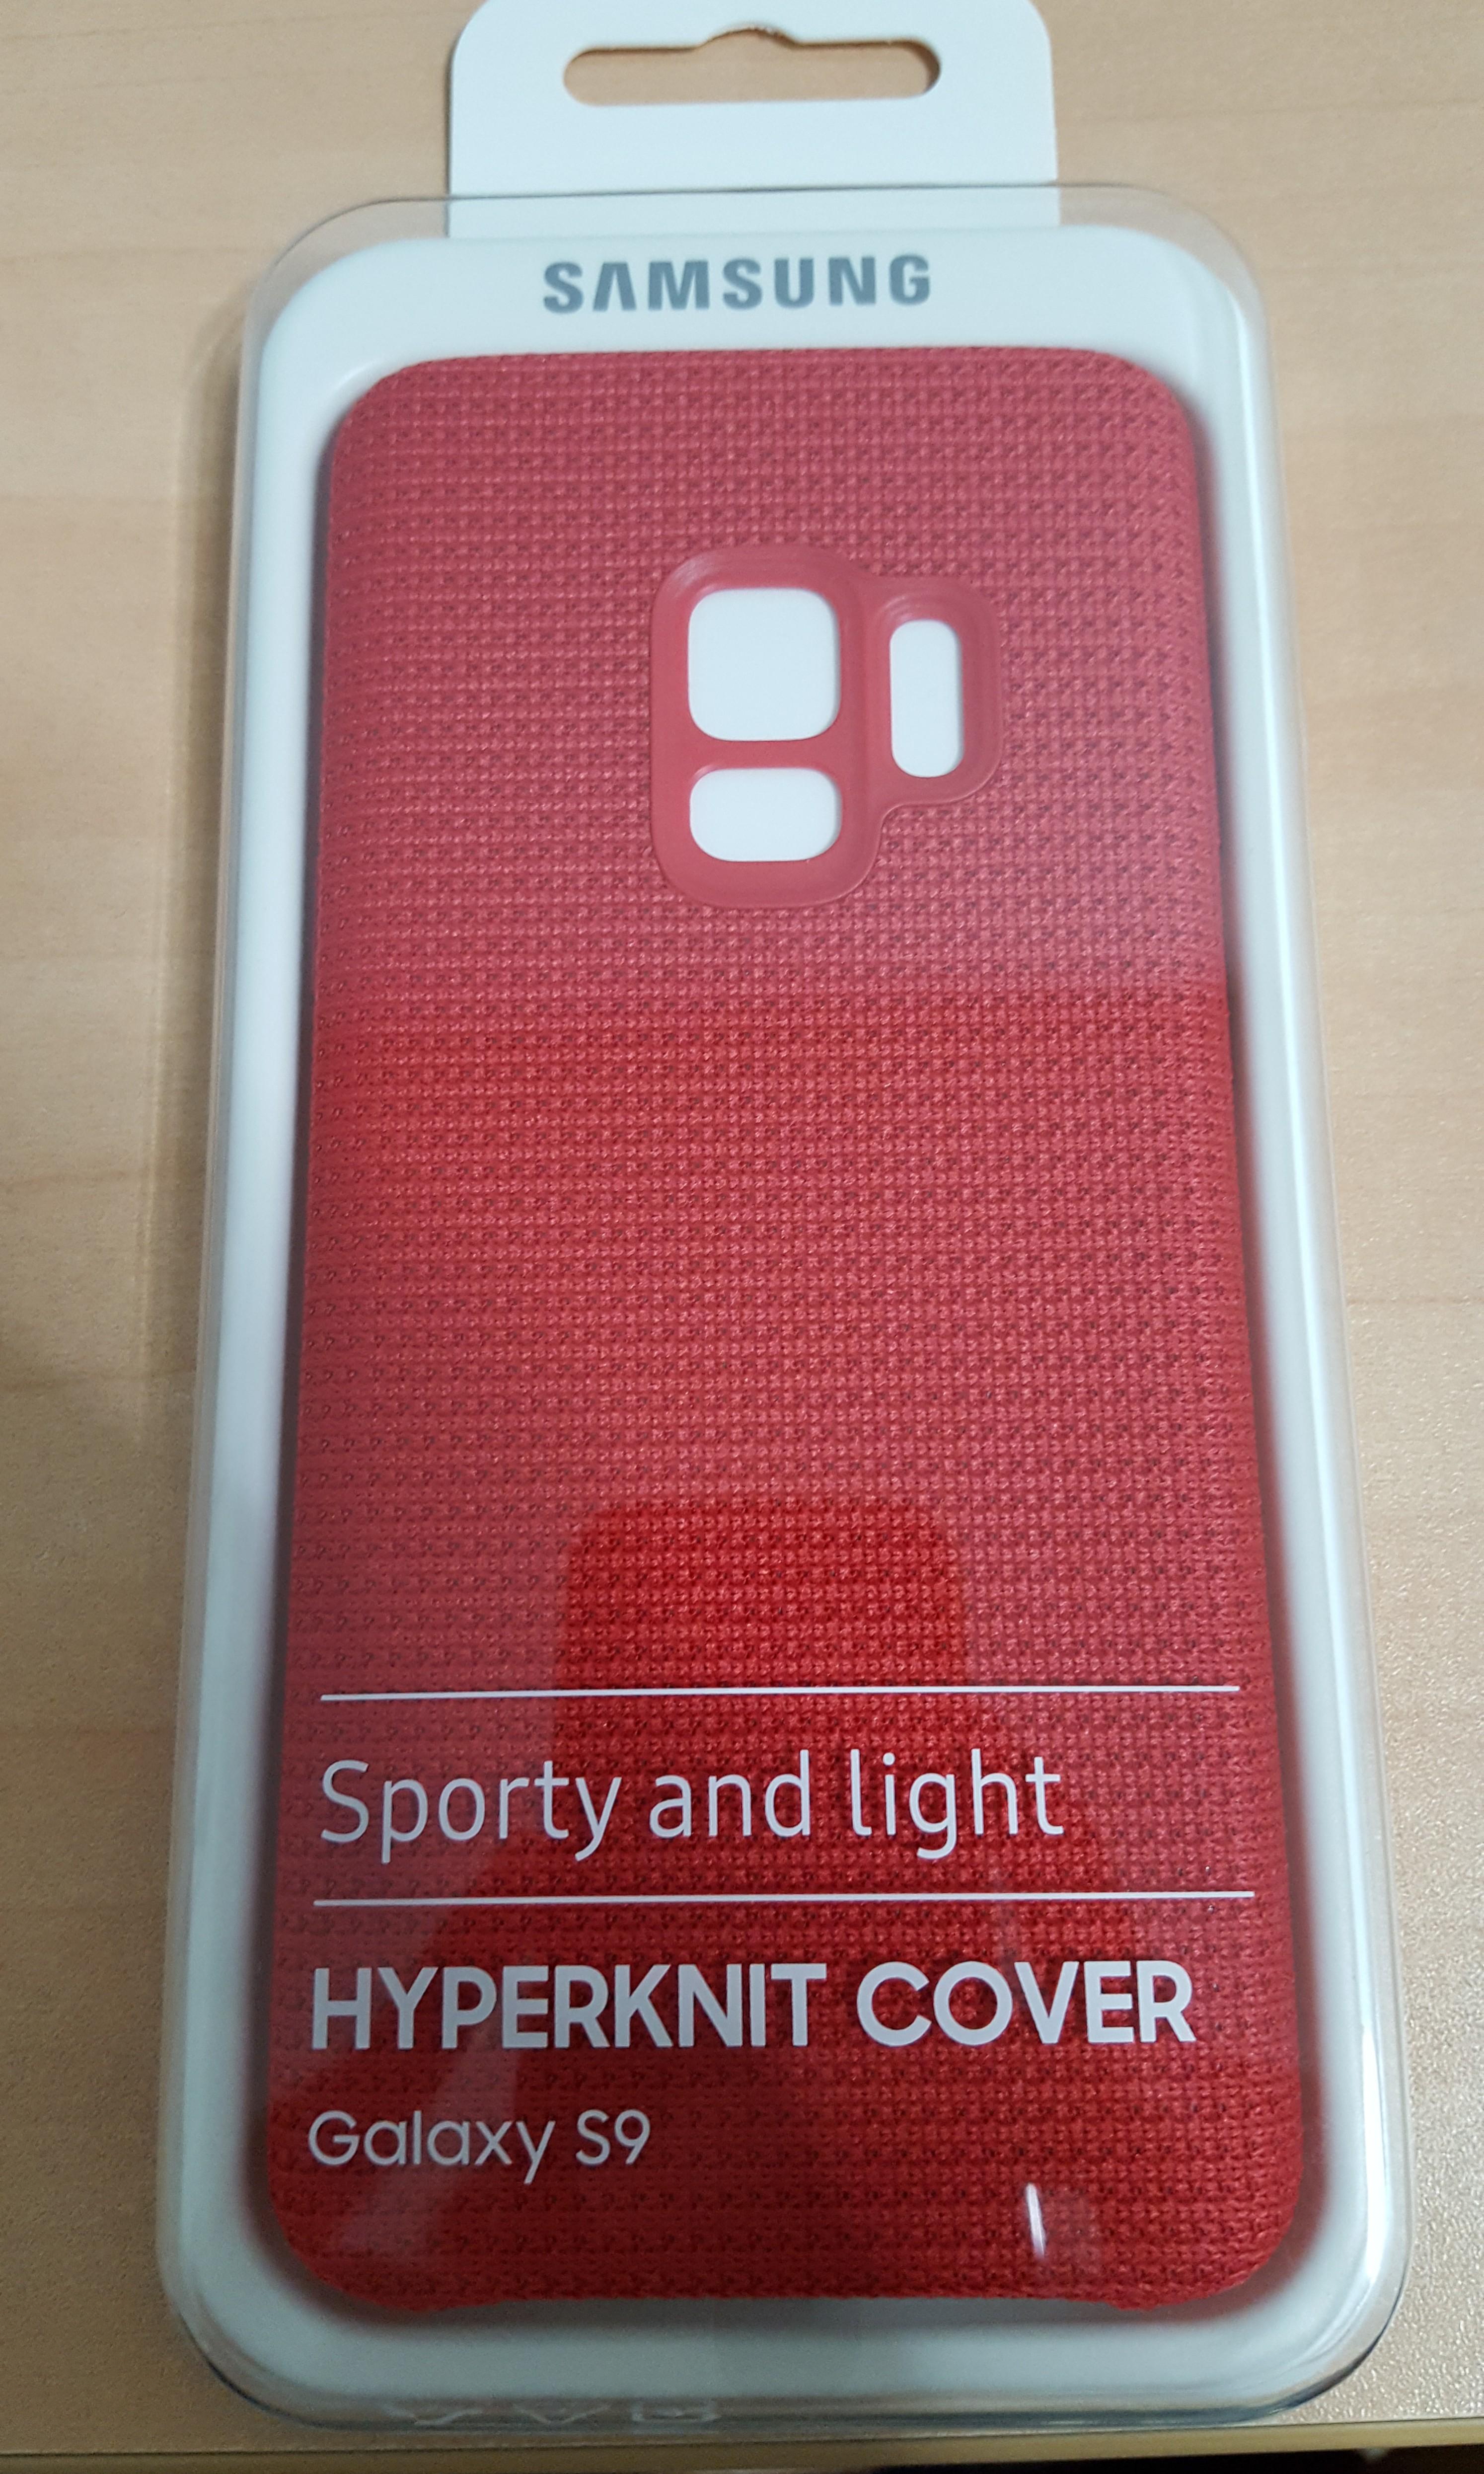 reputable site ca89e 3c77c Samsung Galaxy S9 Hyperknit Cover